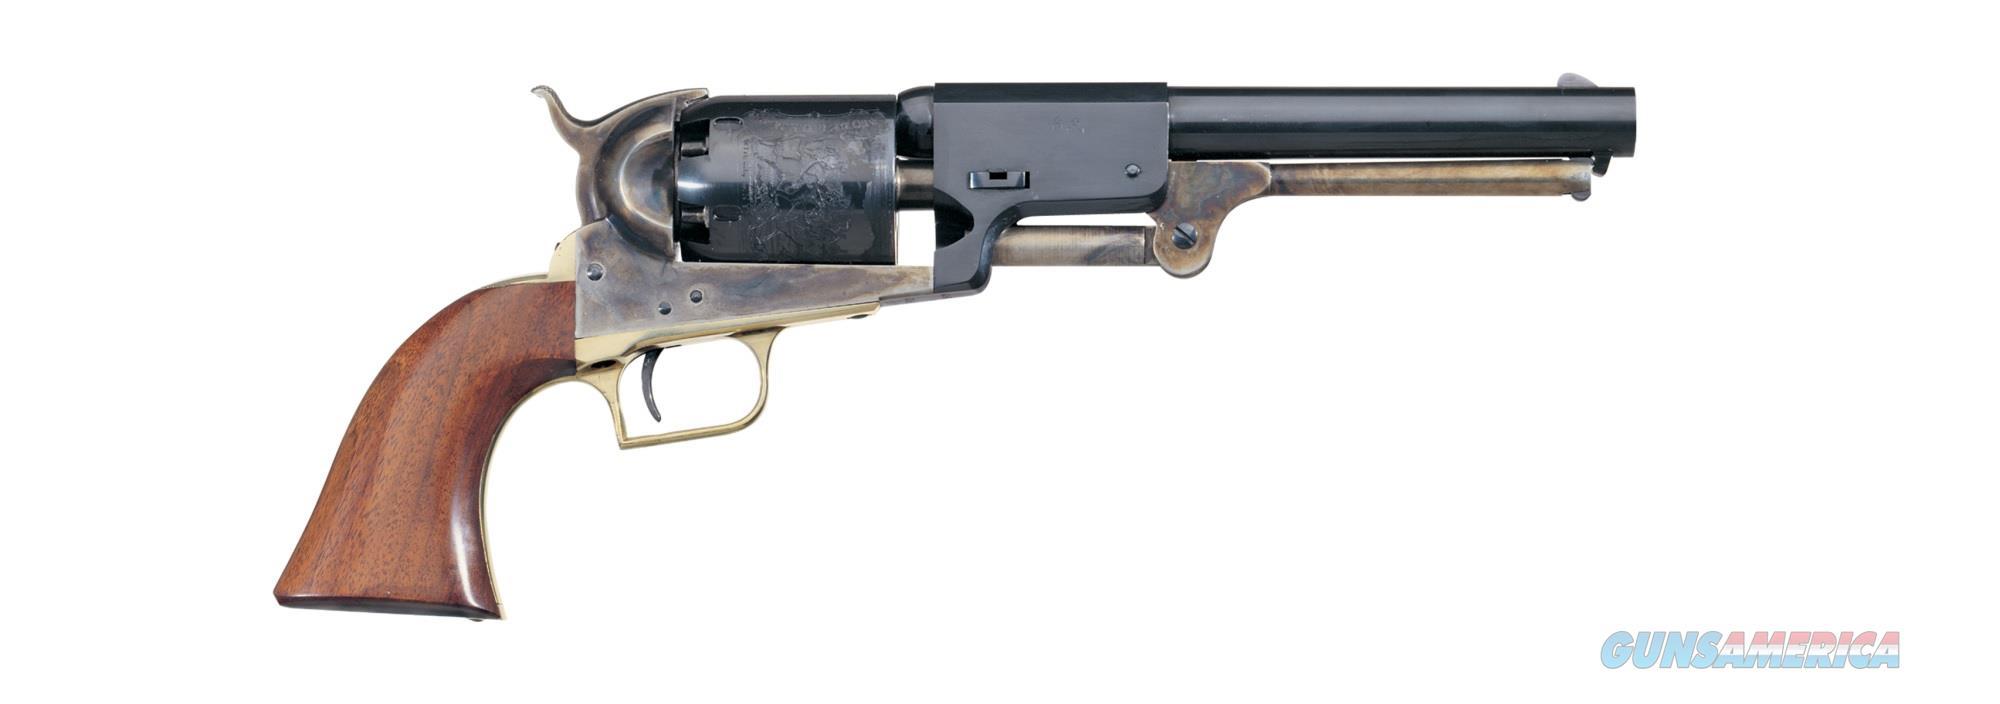 "Uberti 1848 Dragoon First Model .44 7.5"" 340800   Guns > Pistols > Muzzleloading Modern & Replica Pistols (perc)"